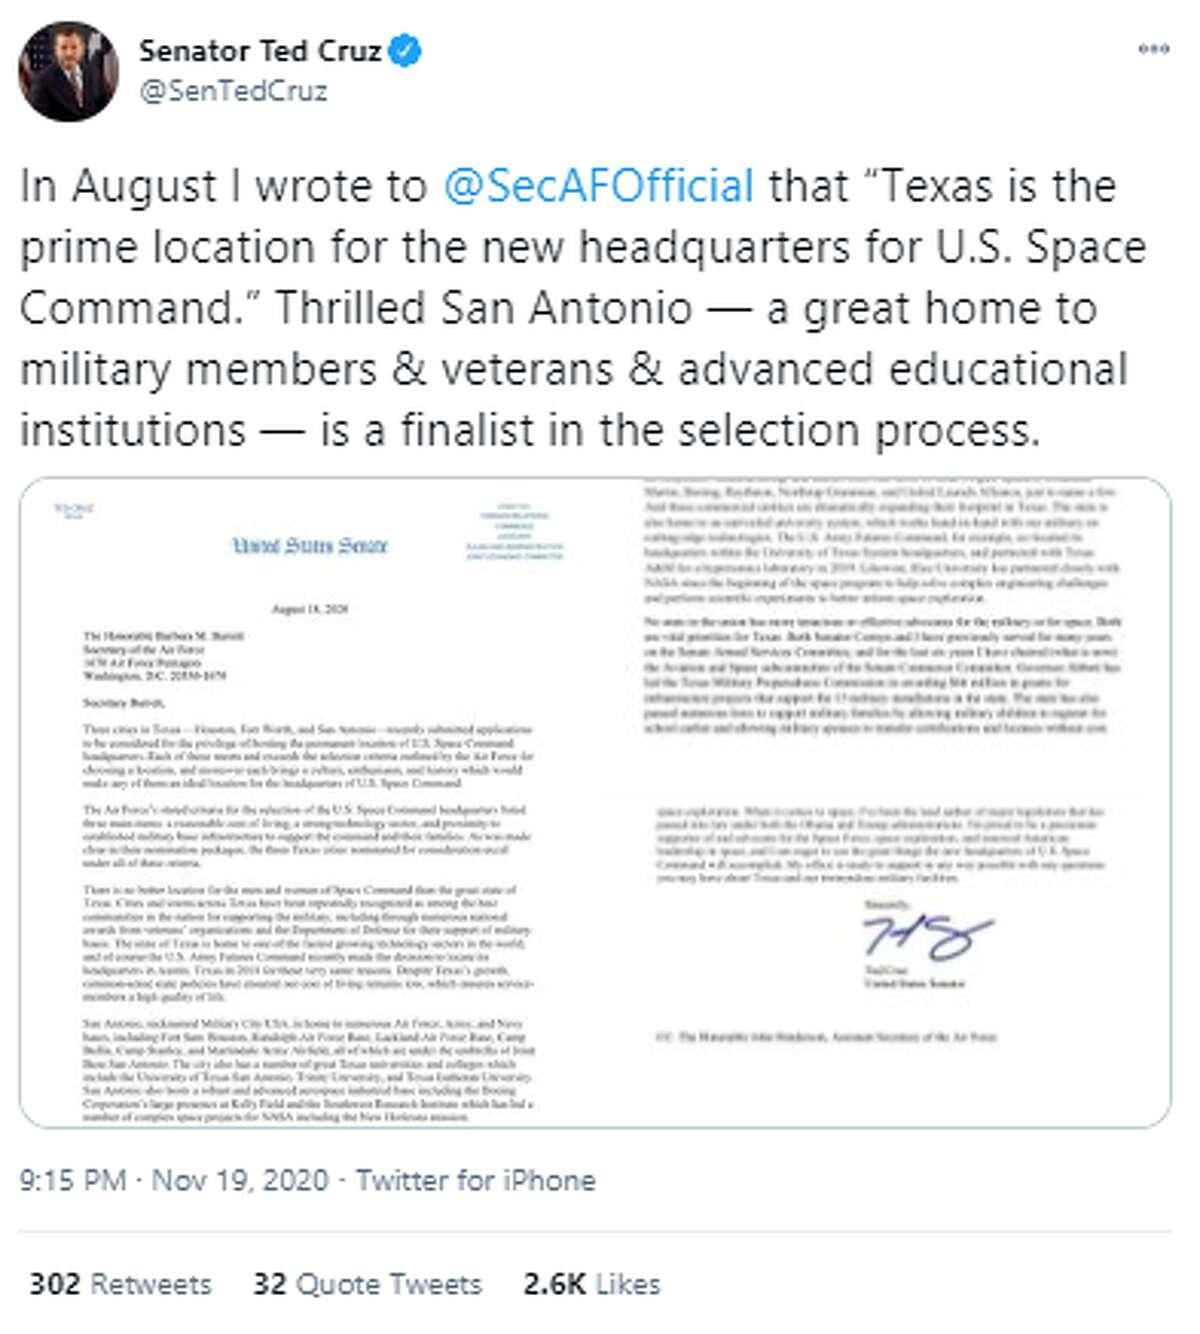 @SenTedCruz: In August I wrote to @SecAFOfficial that